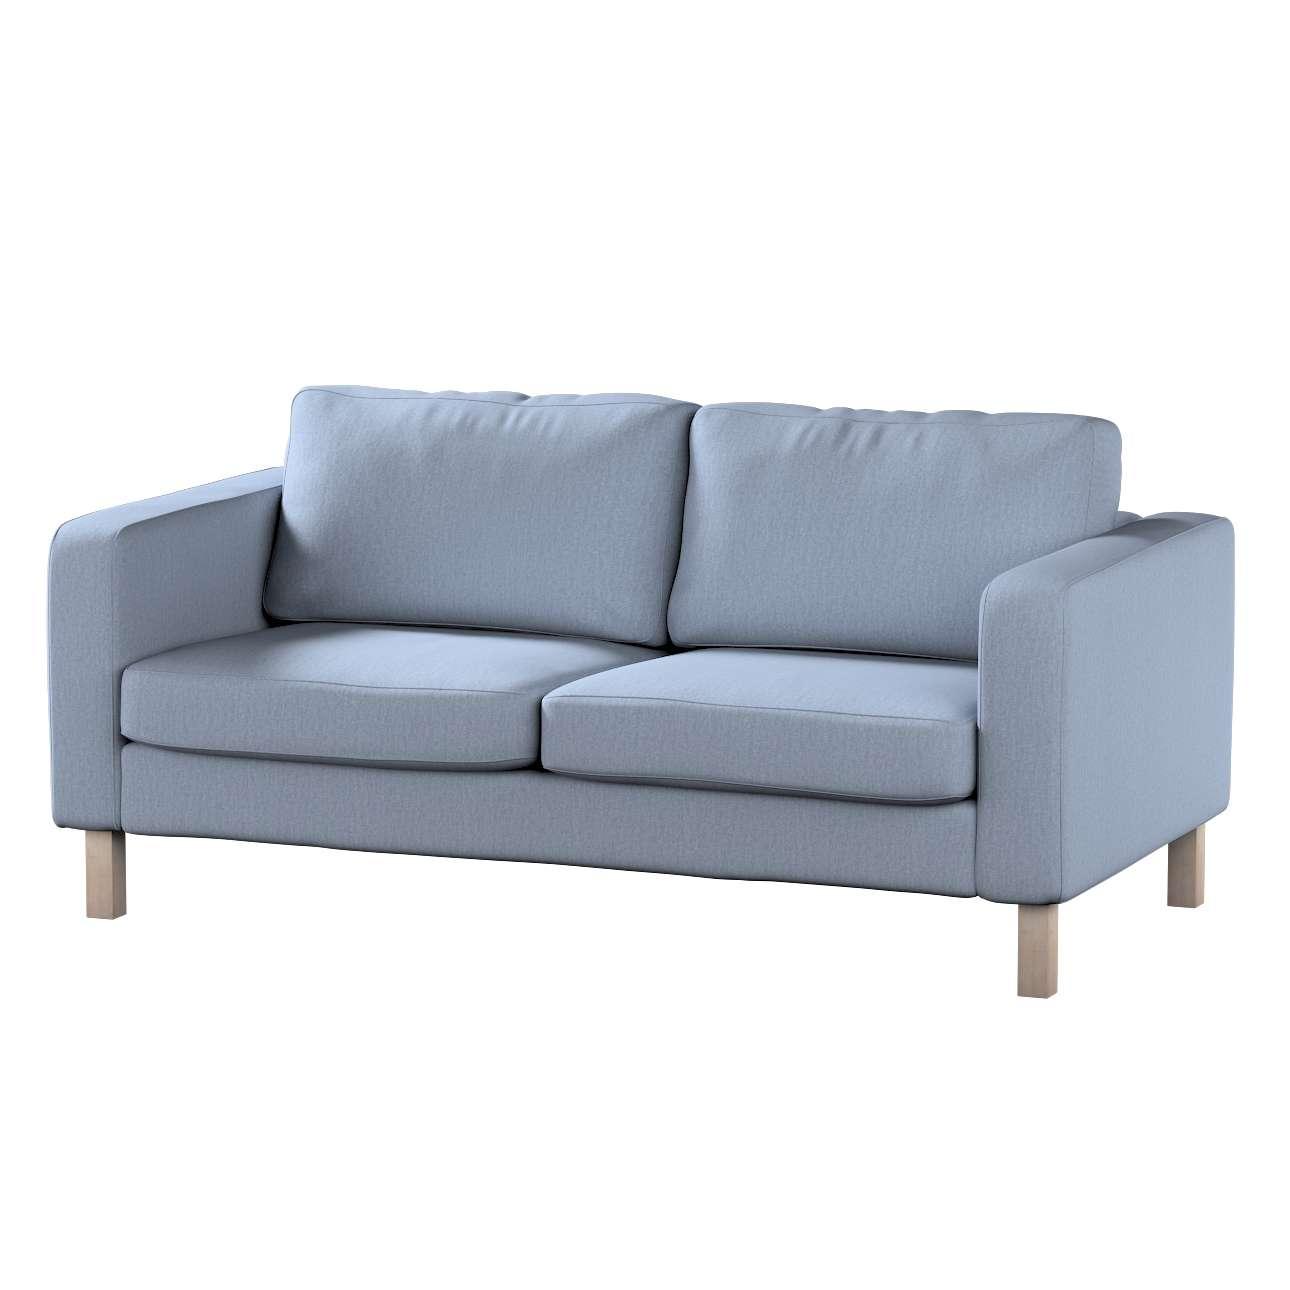 KARSLTAD dvivietės sofos užvalkalas Karlstad 2-vietės sofos užvalkalas kolekcijoje Chenille, audinys: 702-13